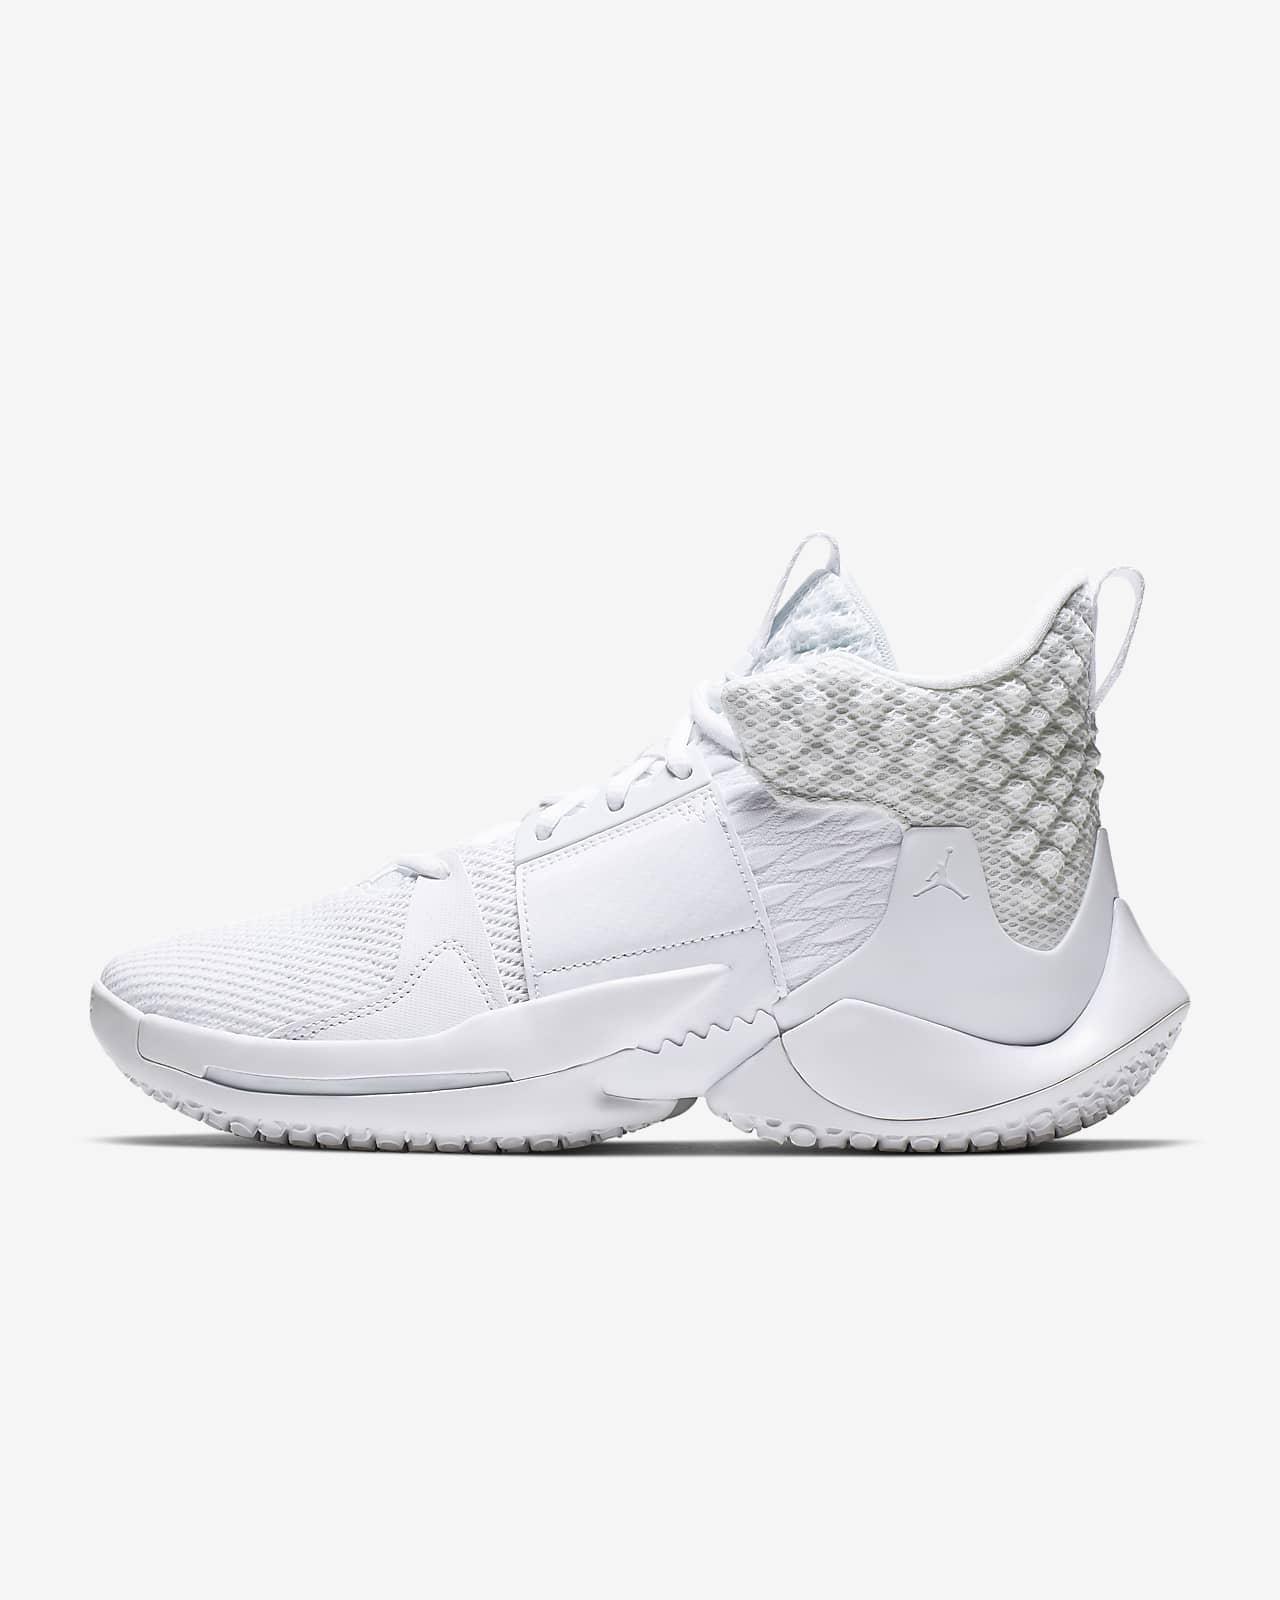 Zer0 2 Basketball Shoes Nike Id